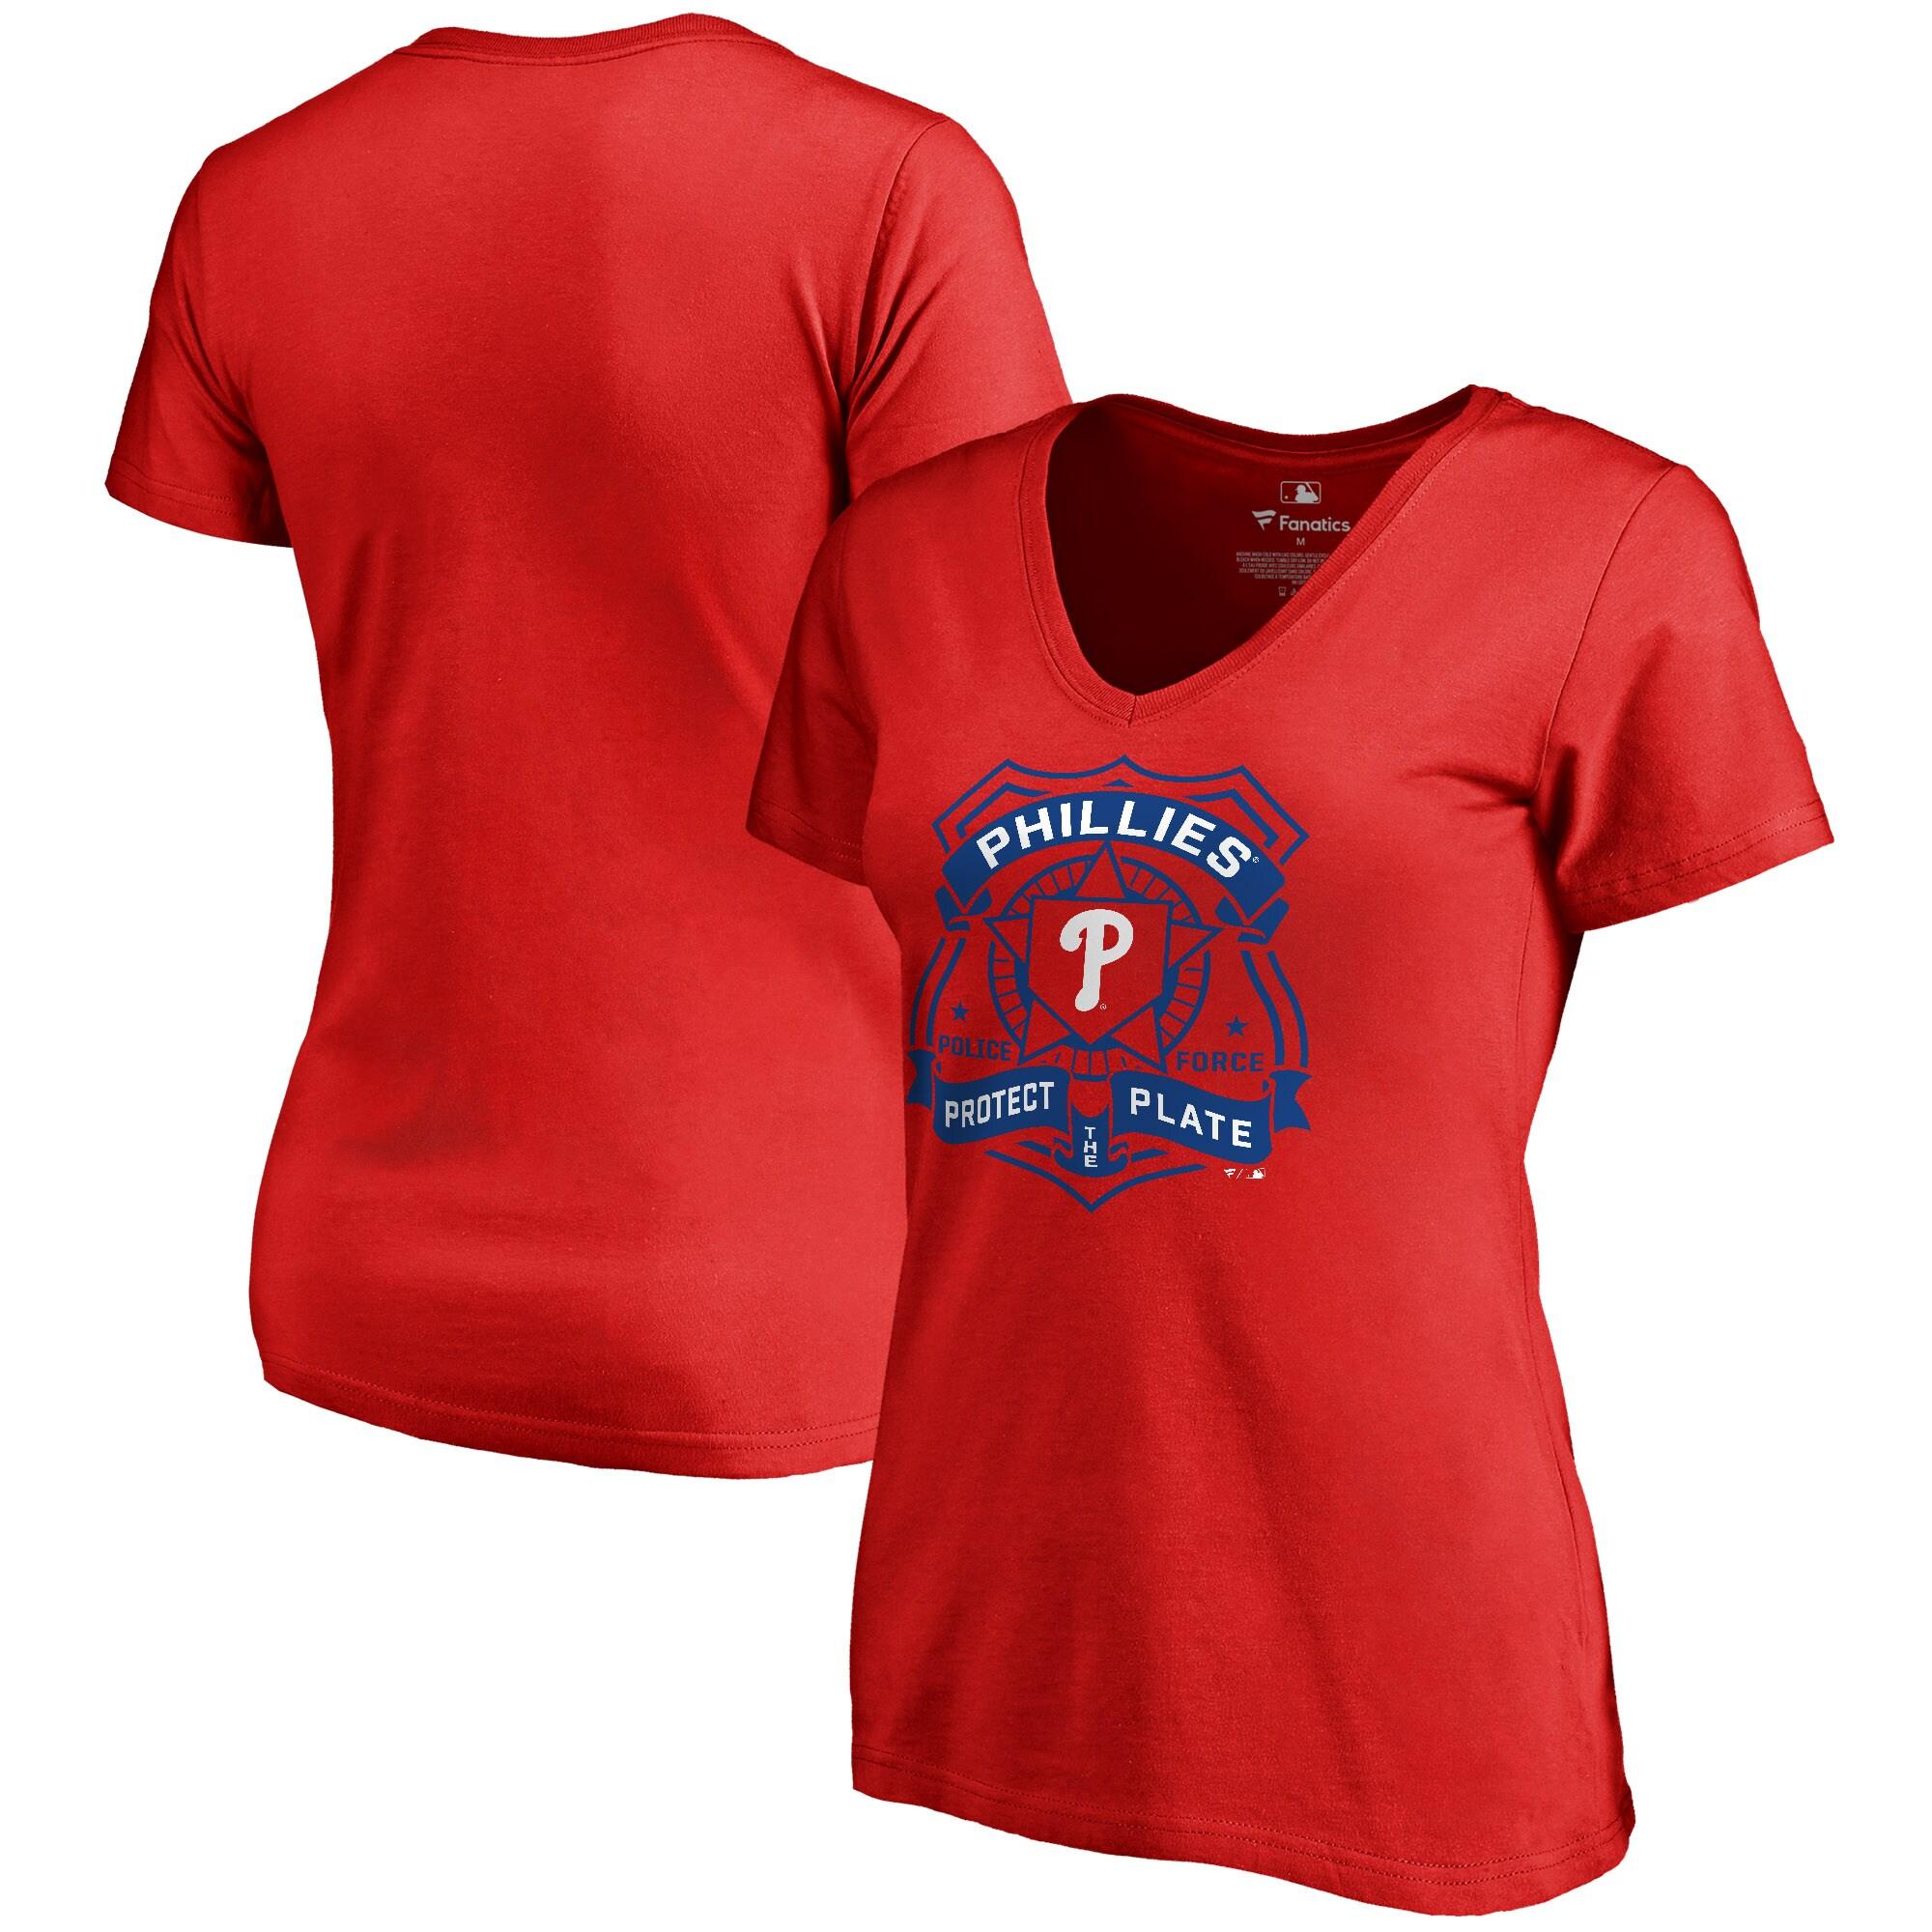 Philadelphia Phillies Women's Police Badge T-Shirt - Red